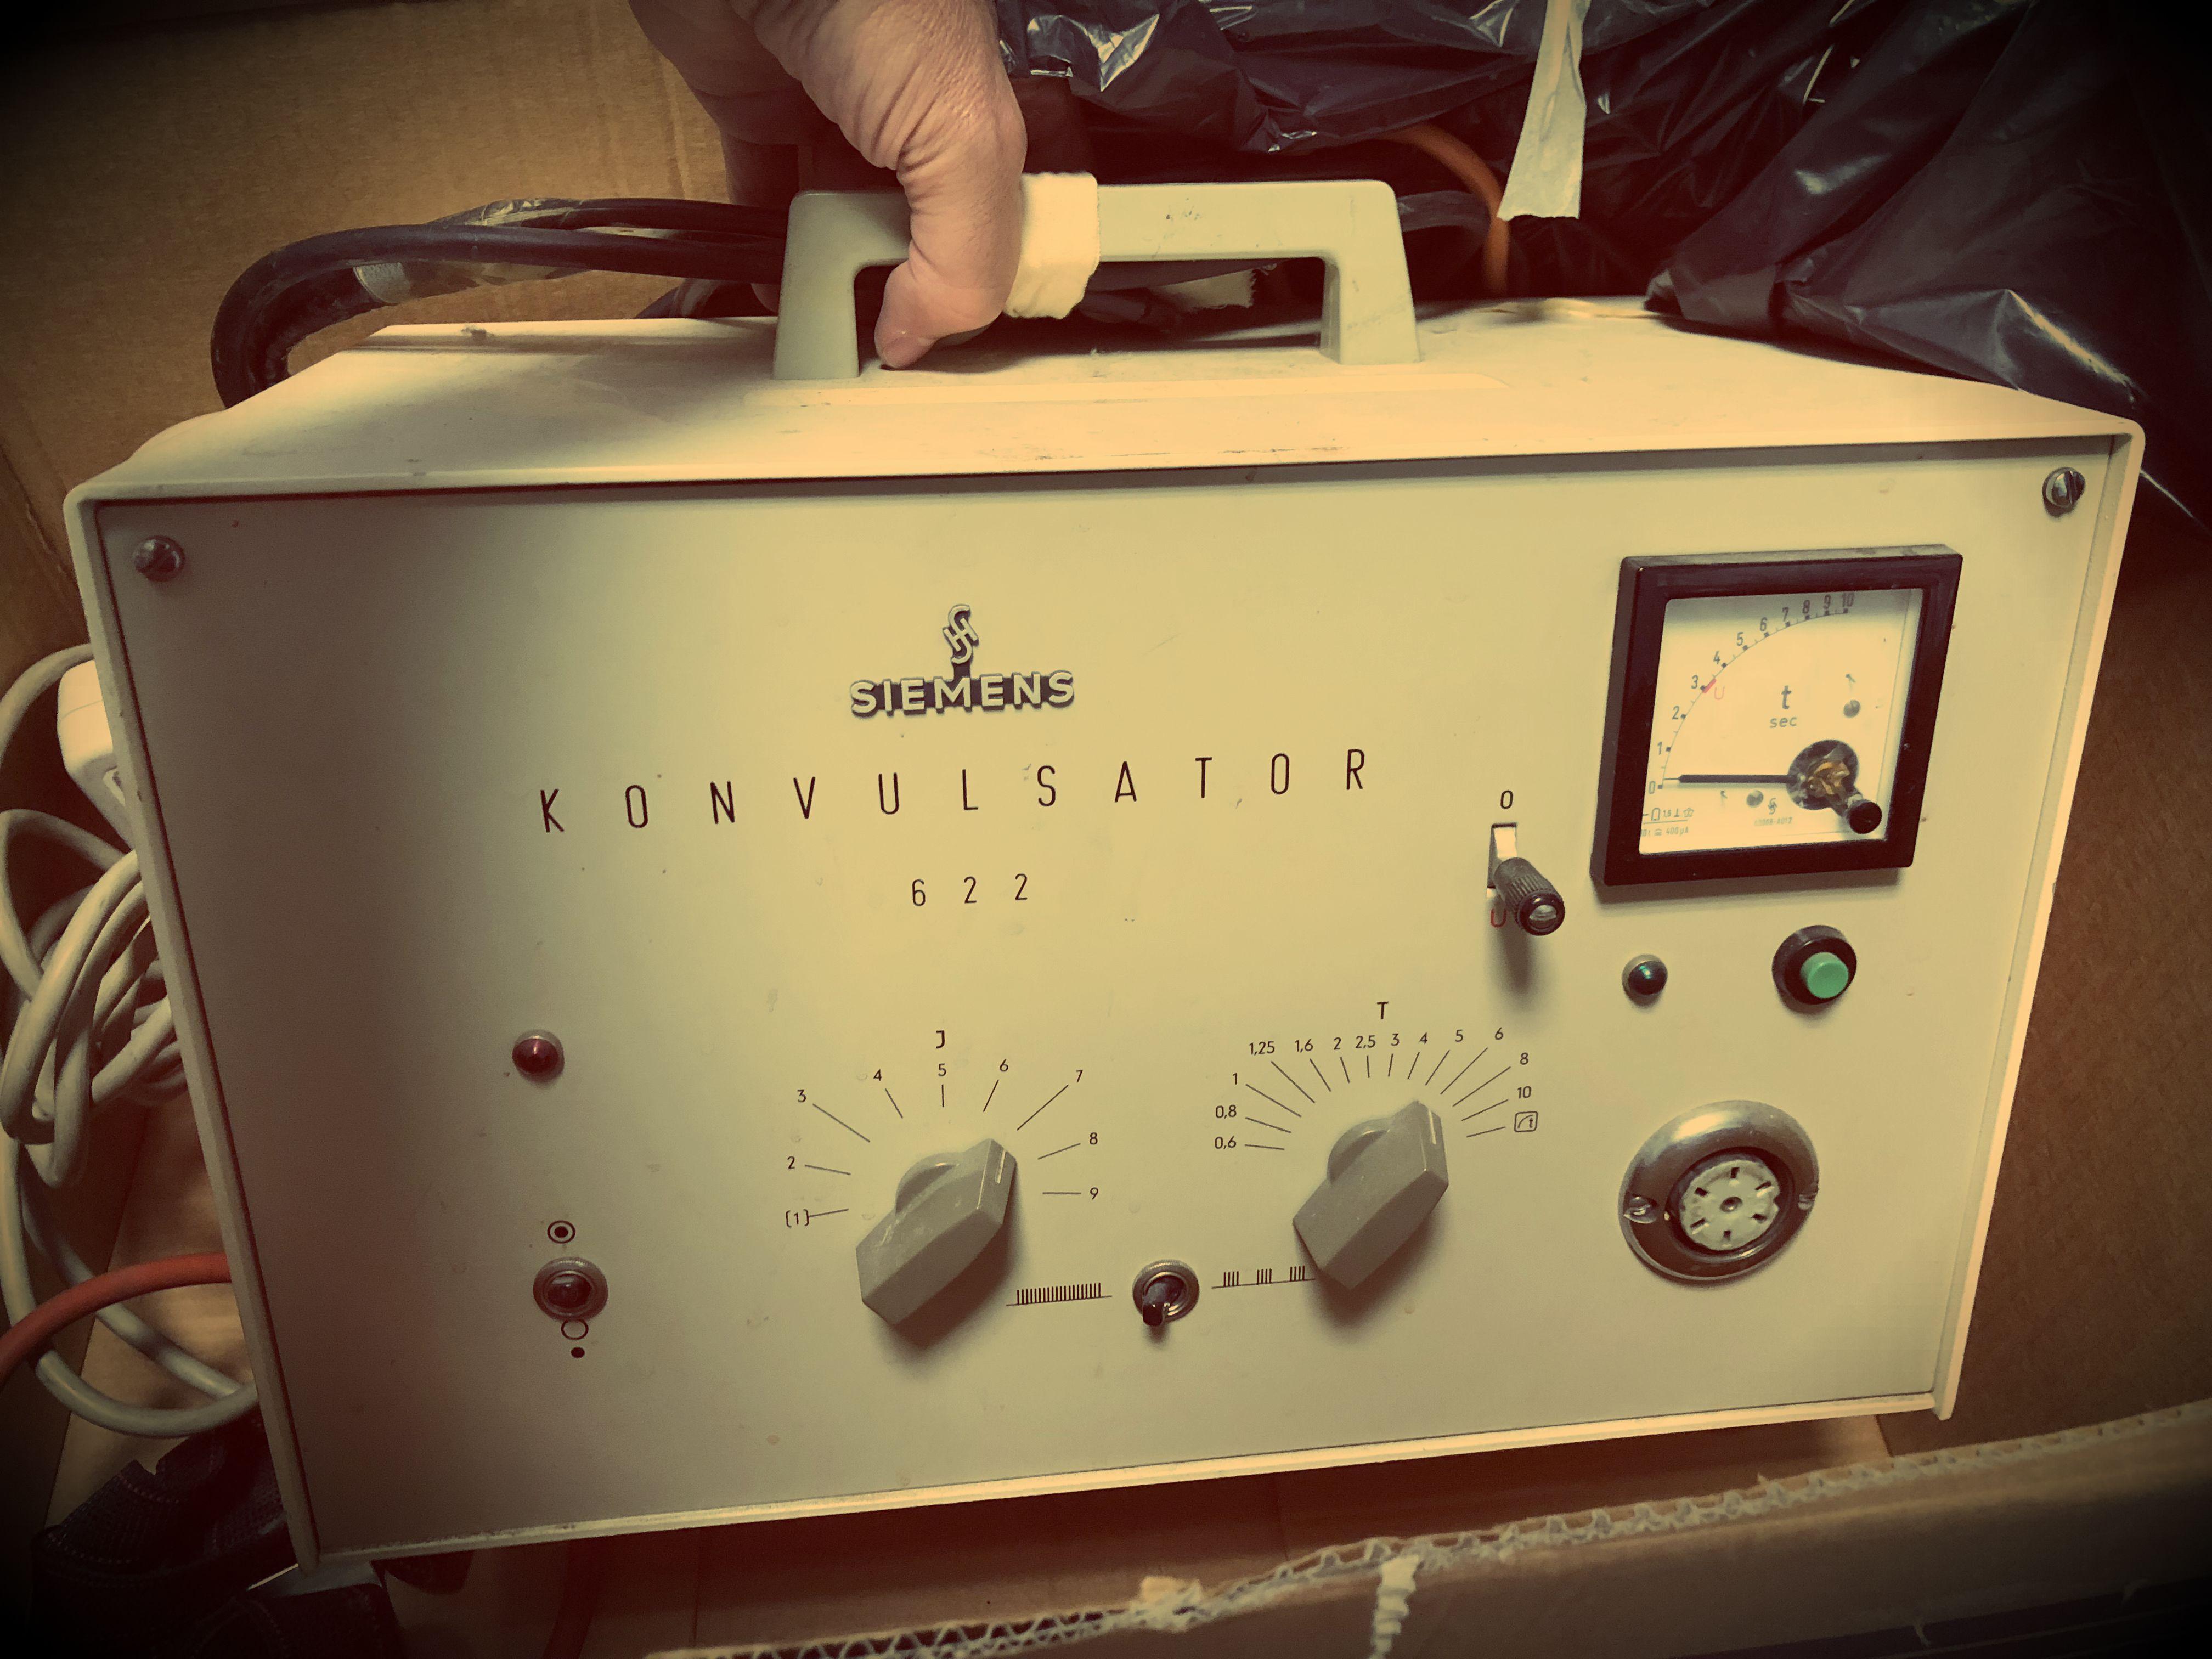 macchina-per-elettroshock-siemens-konvulsator-622